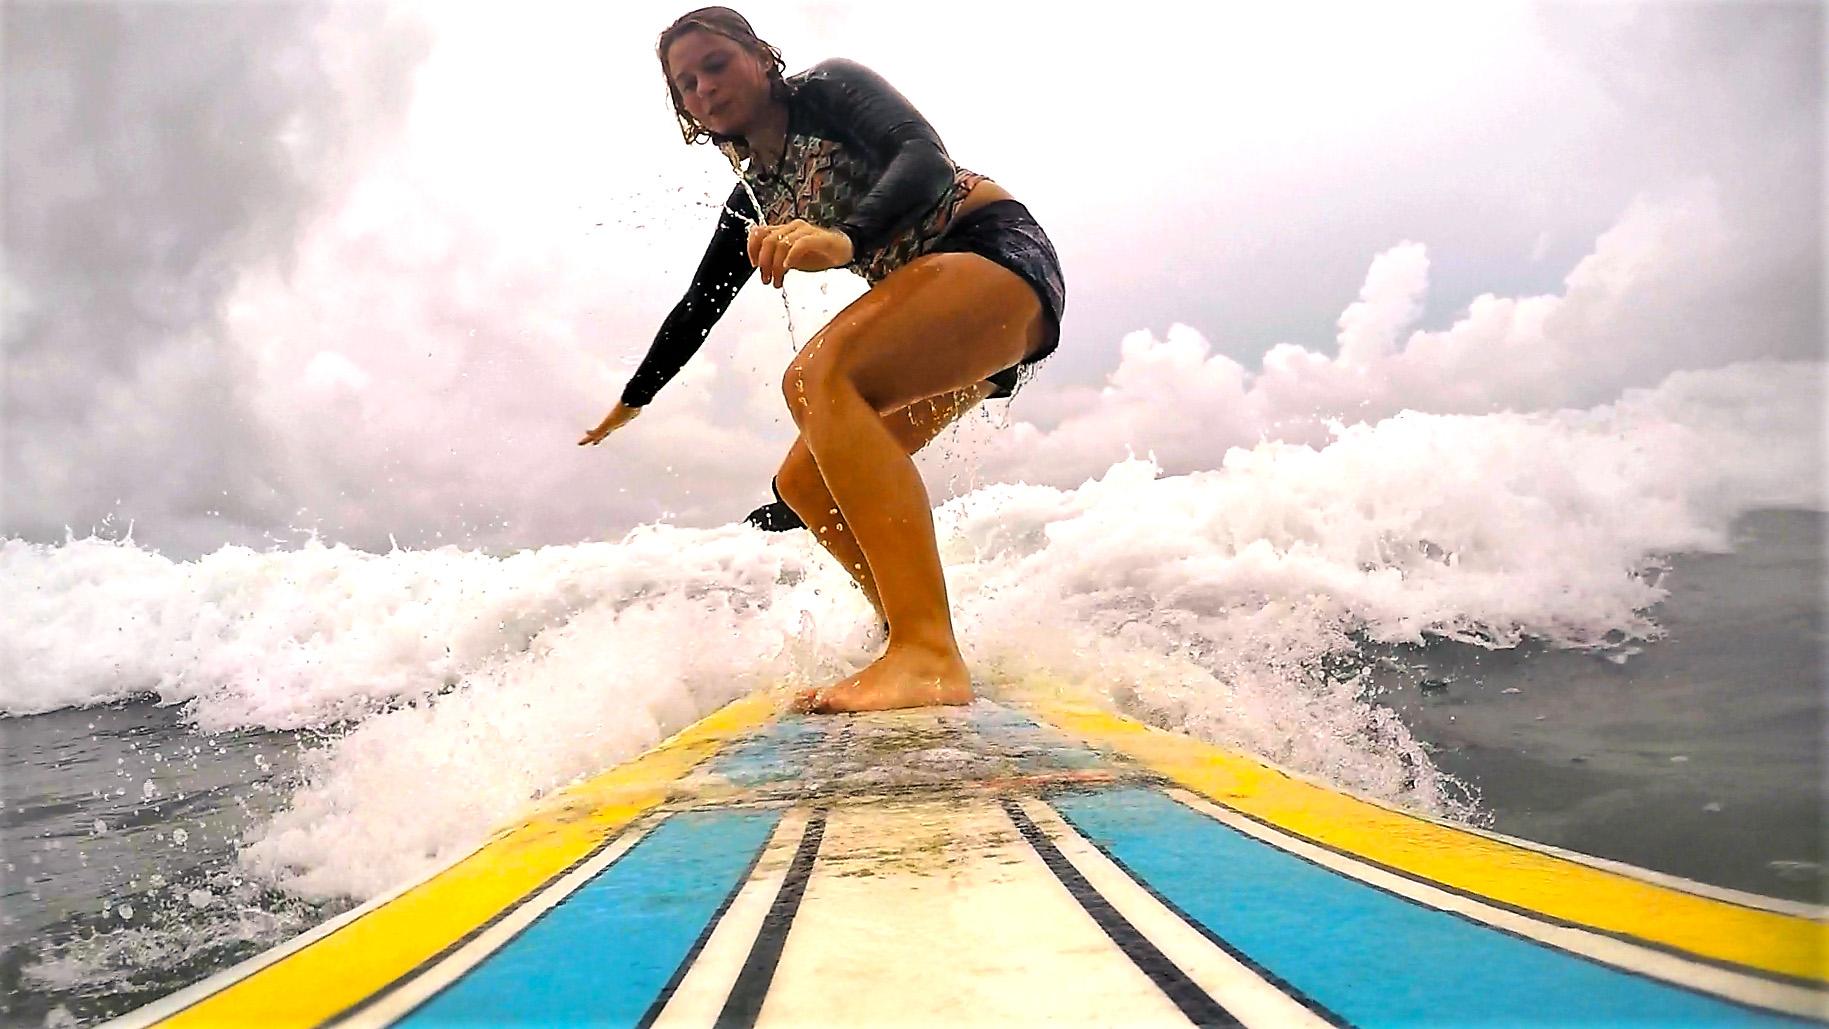 Surfing Cabuya Costa Rica.jpg